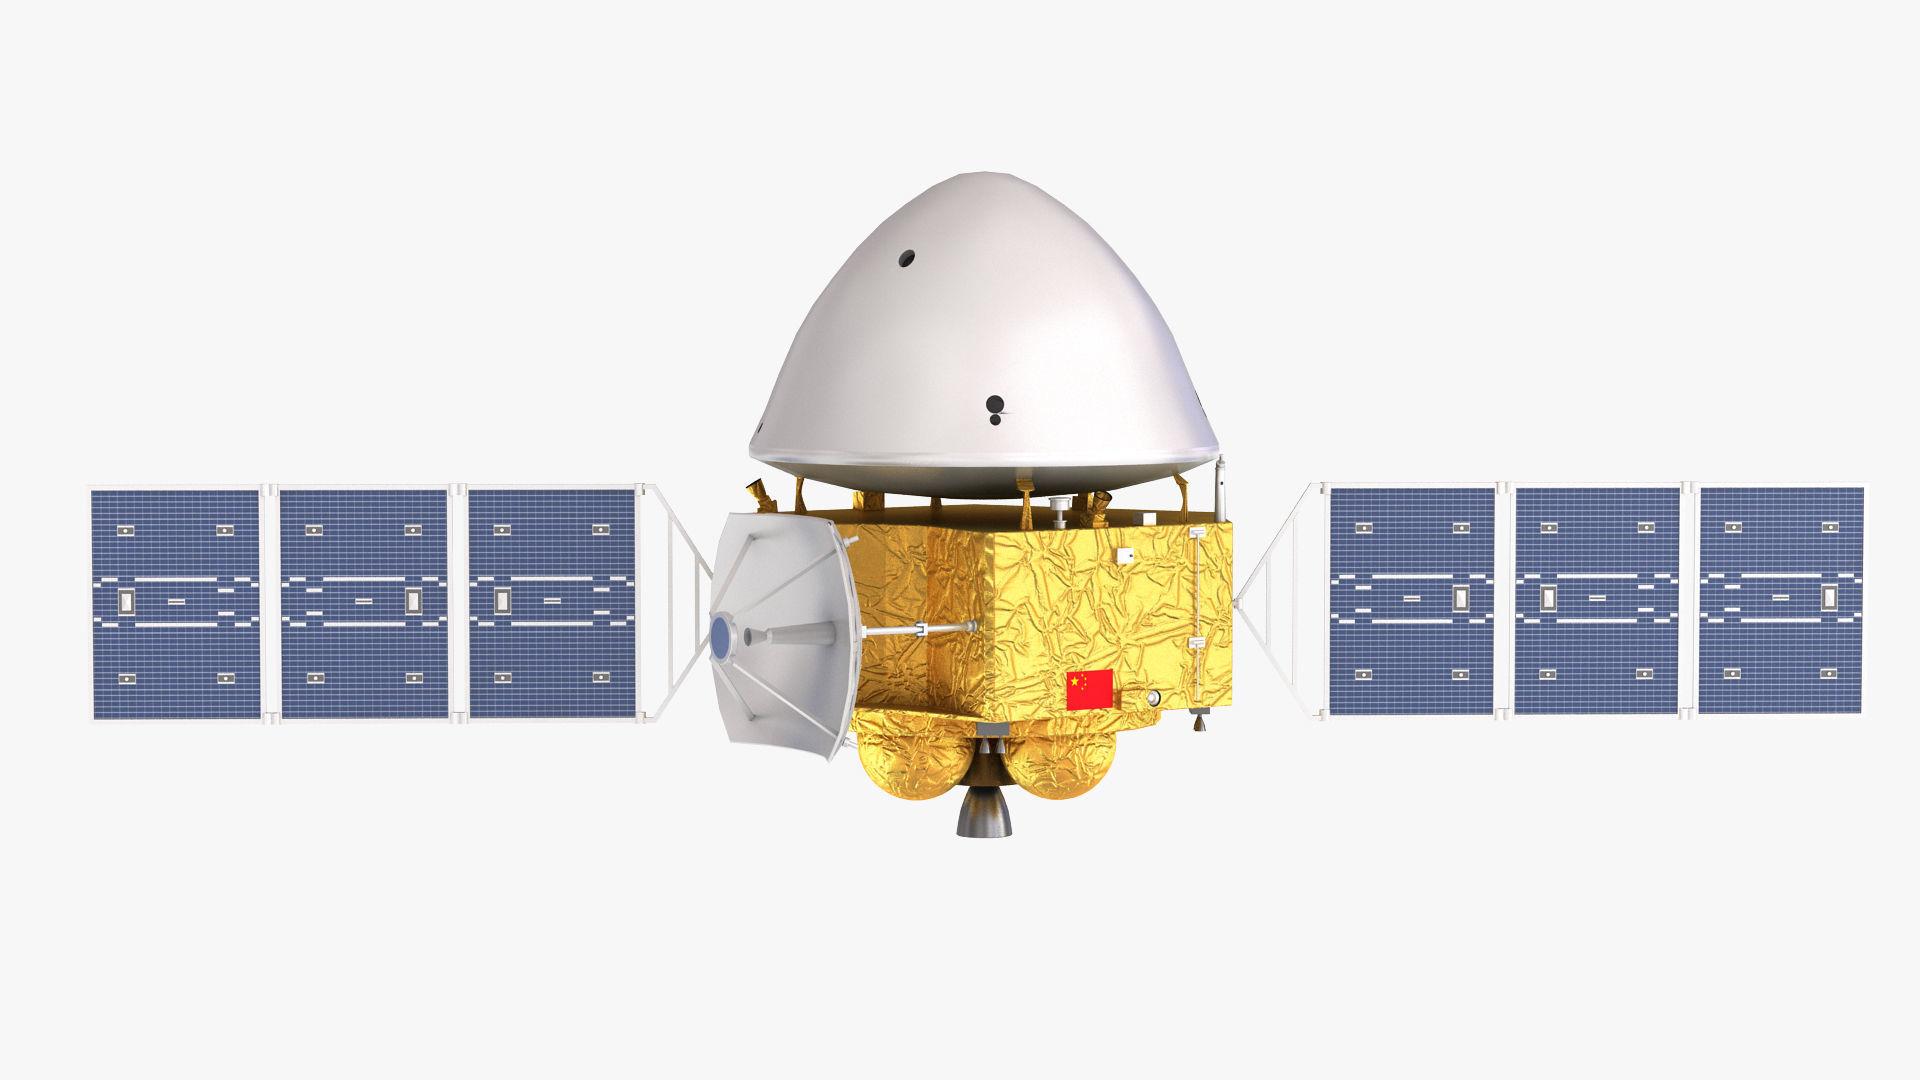 Tianwen Mars probe exploration mission CASC 2